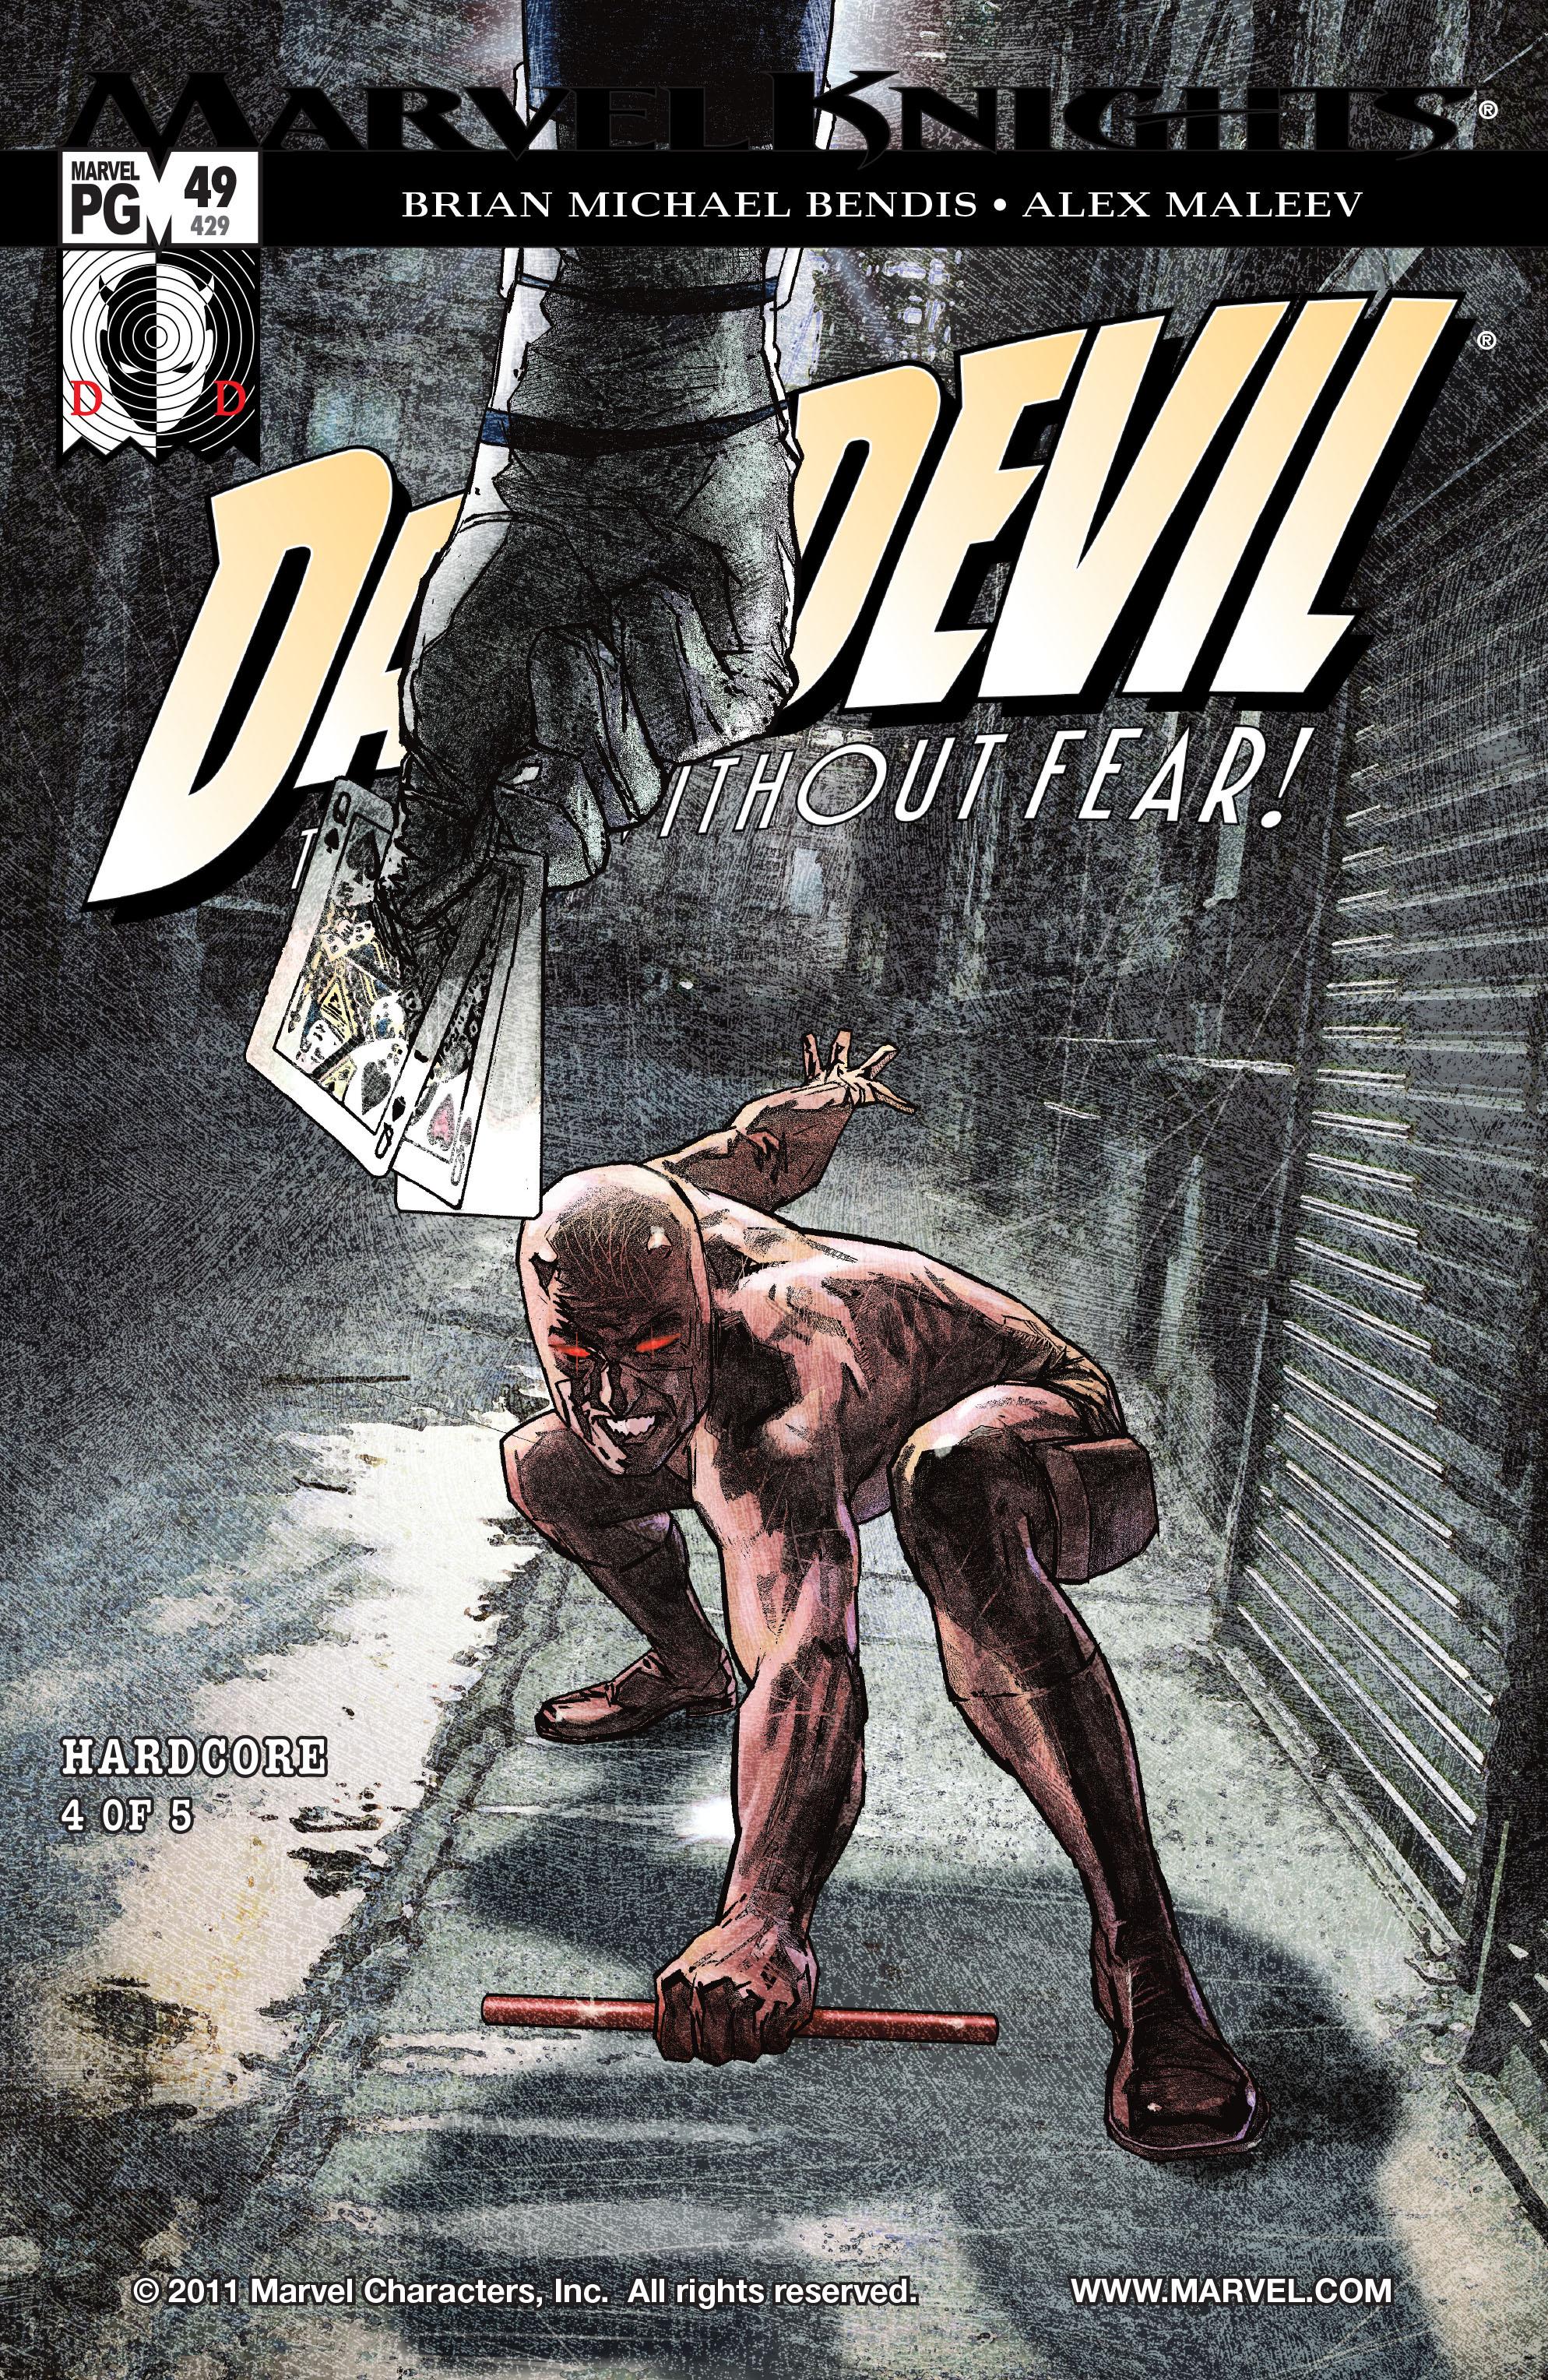 Daredevil (1998) 49 Page 1